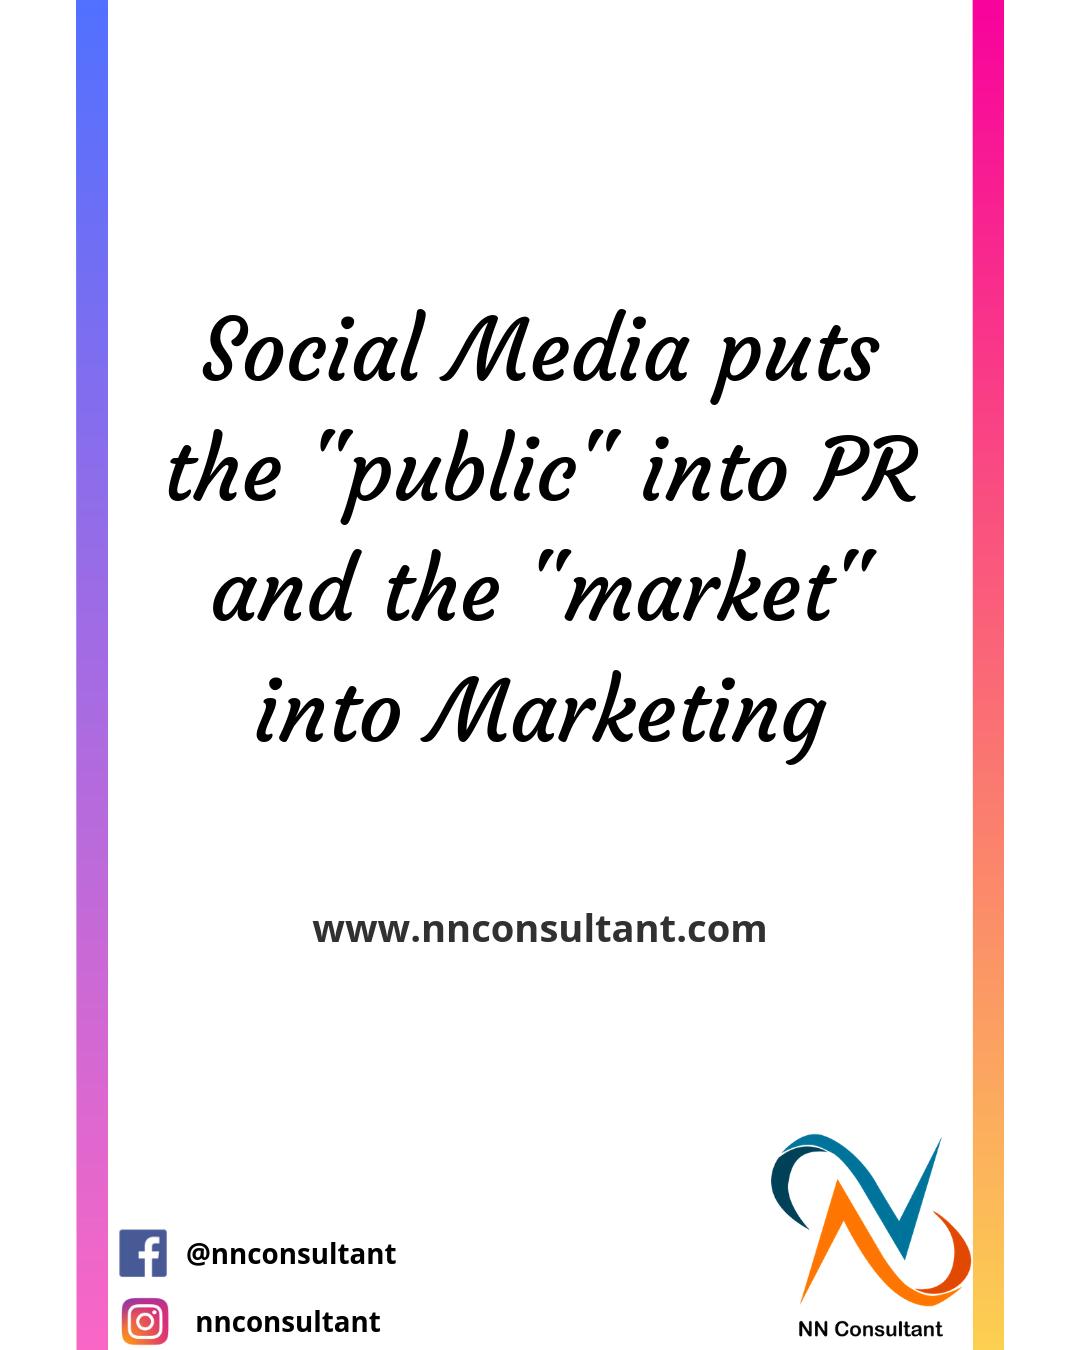 Social Media Social Media puts the